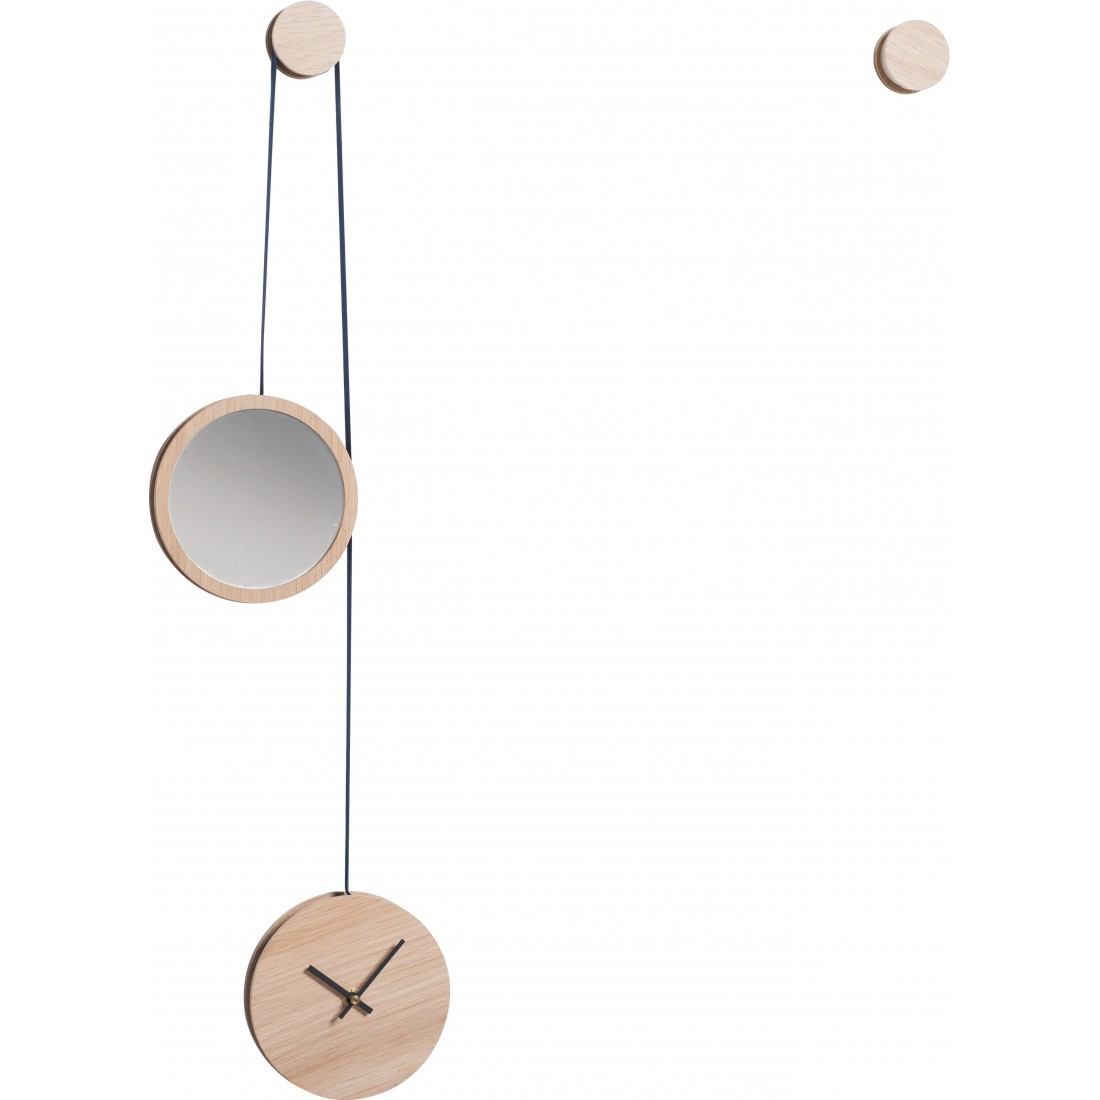 Horloge-Miroir PENDULE Drugeot Labo Noir